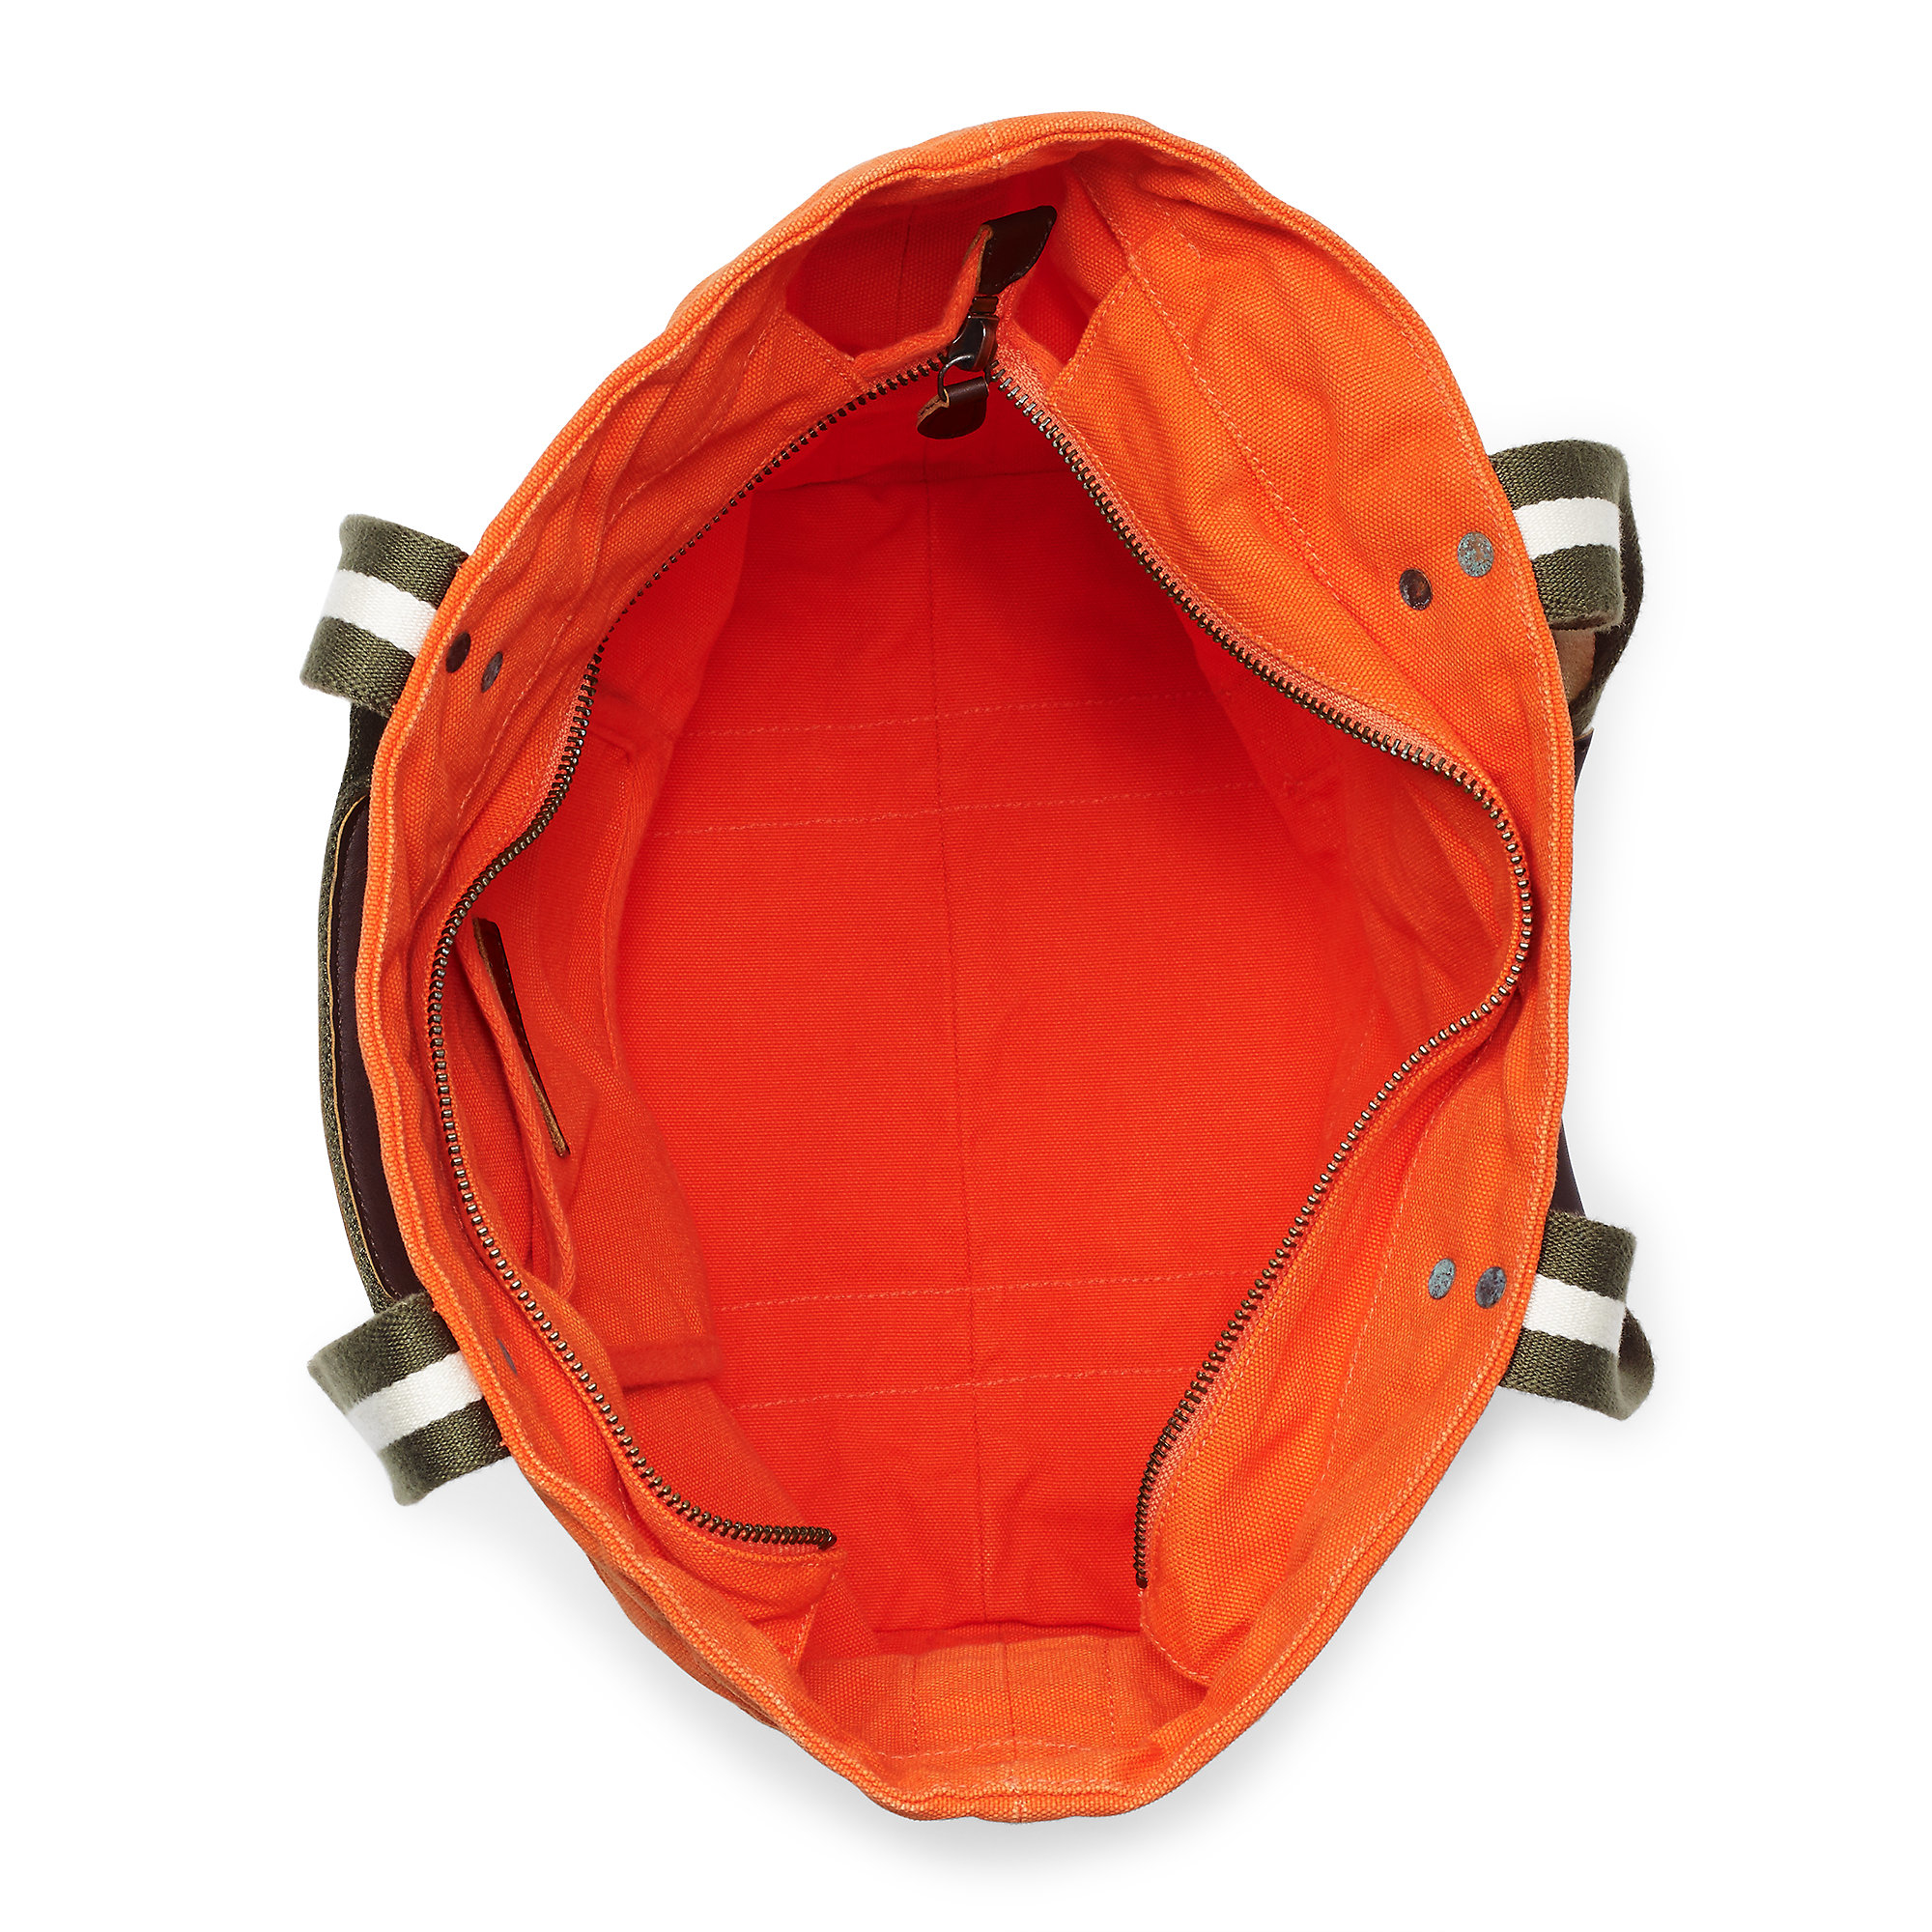 37db2be33bff Ralph Lauren Pony Slim Handbag Red Canvas - Jaimonvoyage.com